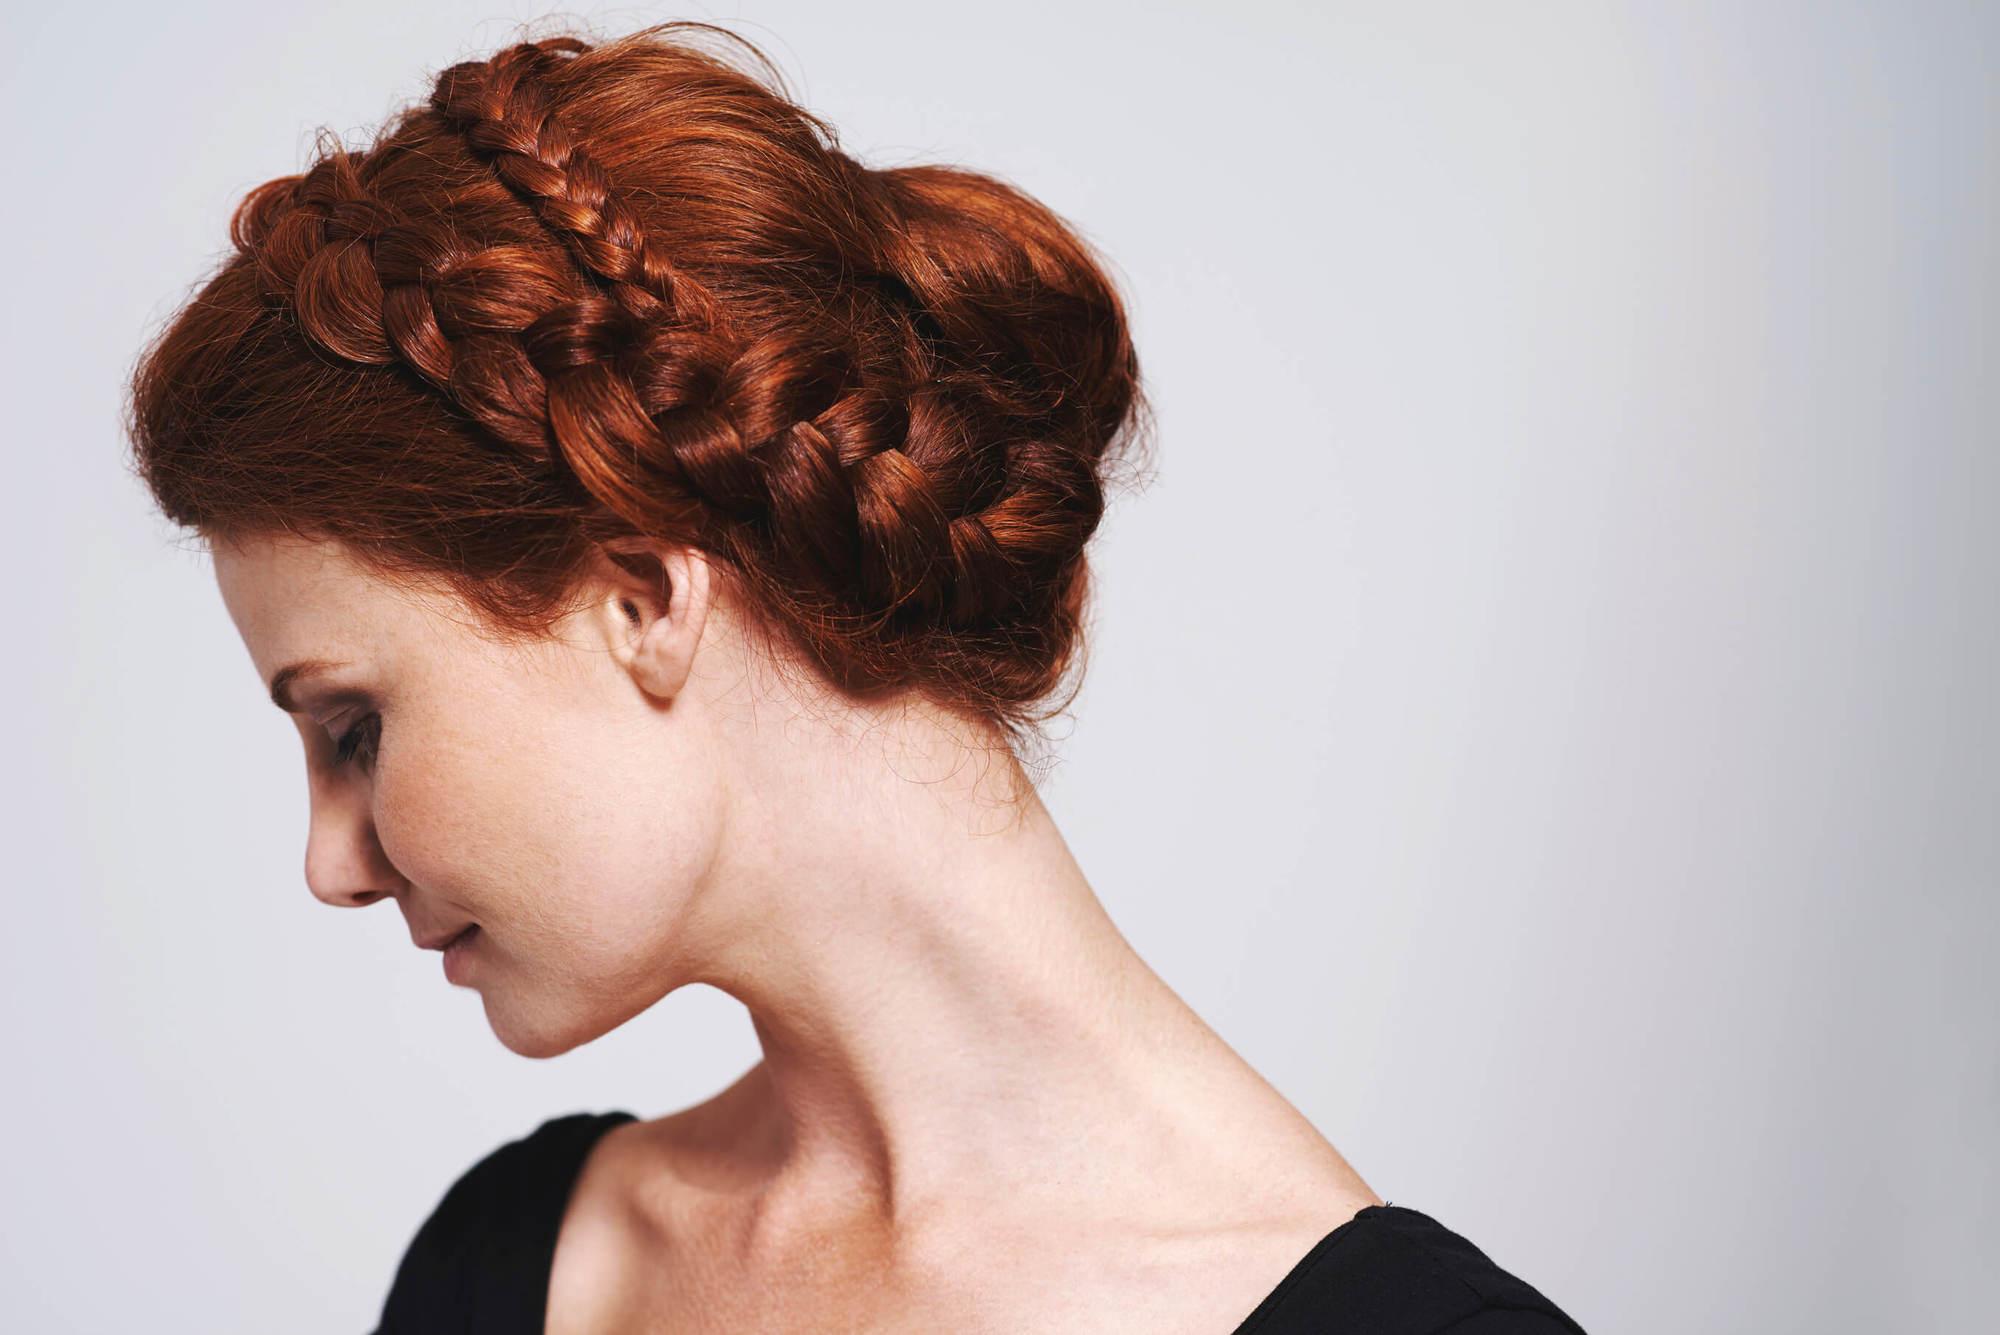 colored braids dark red hair braided updo